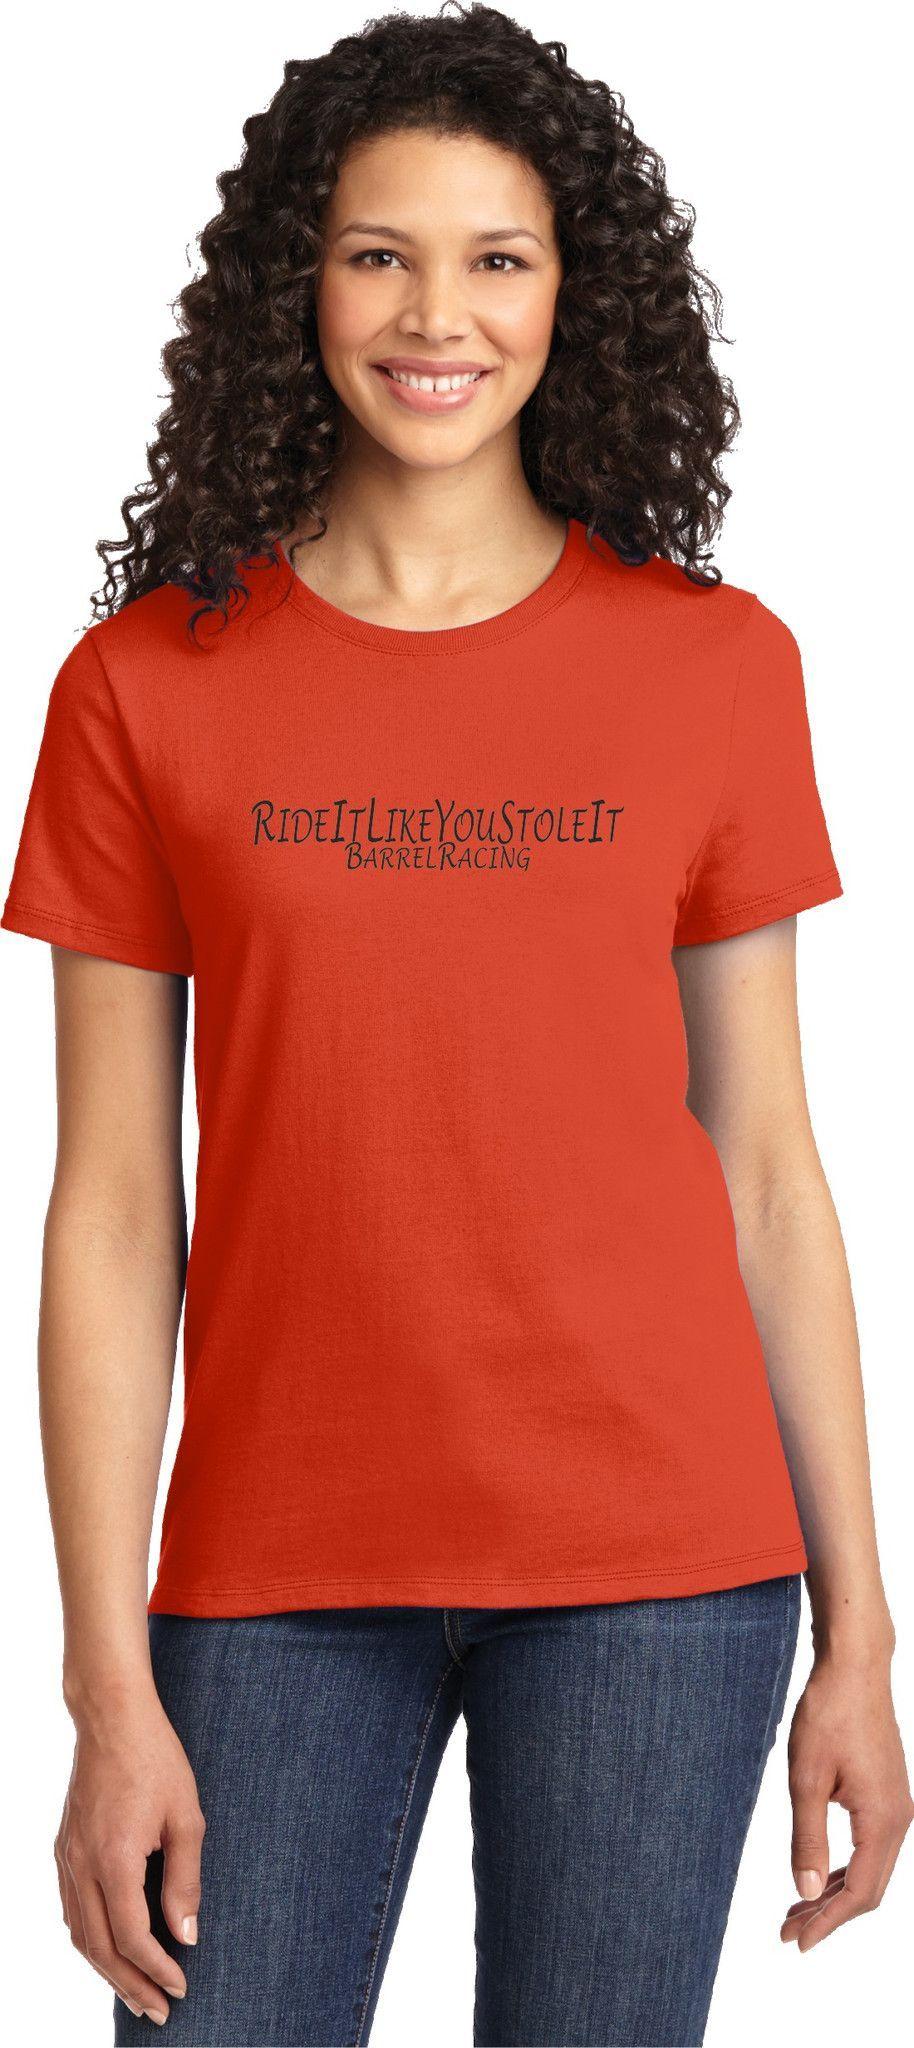 Ride It Like You Stole It Barrel Racing Ladies Orange T-Shirt